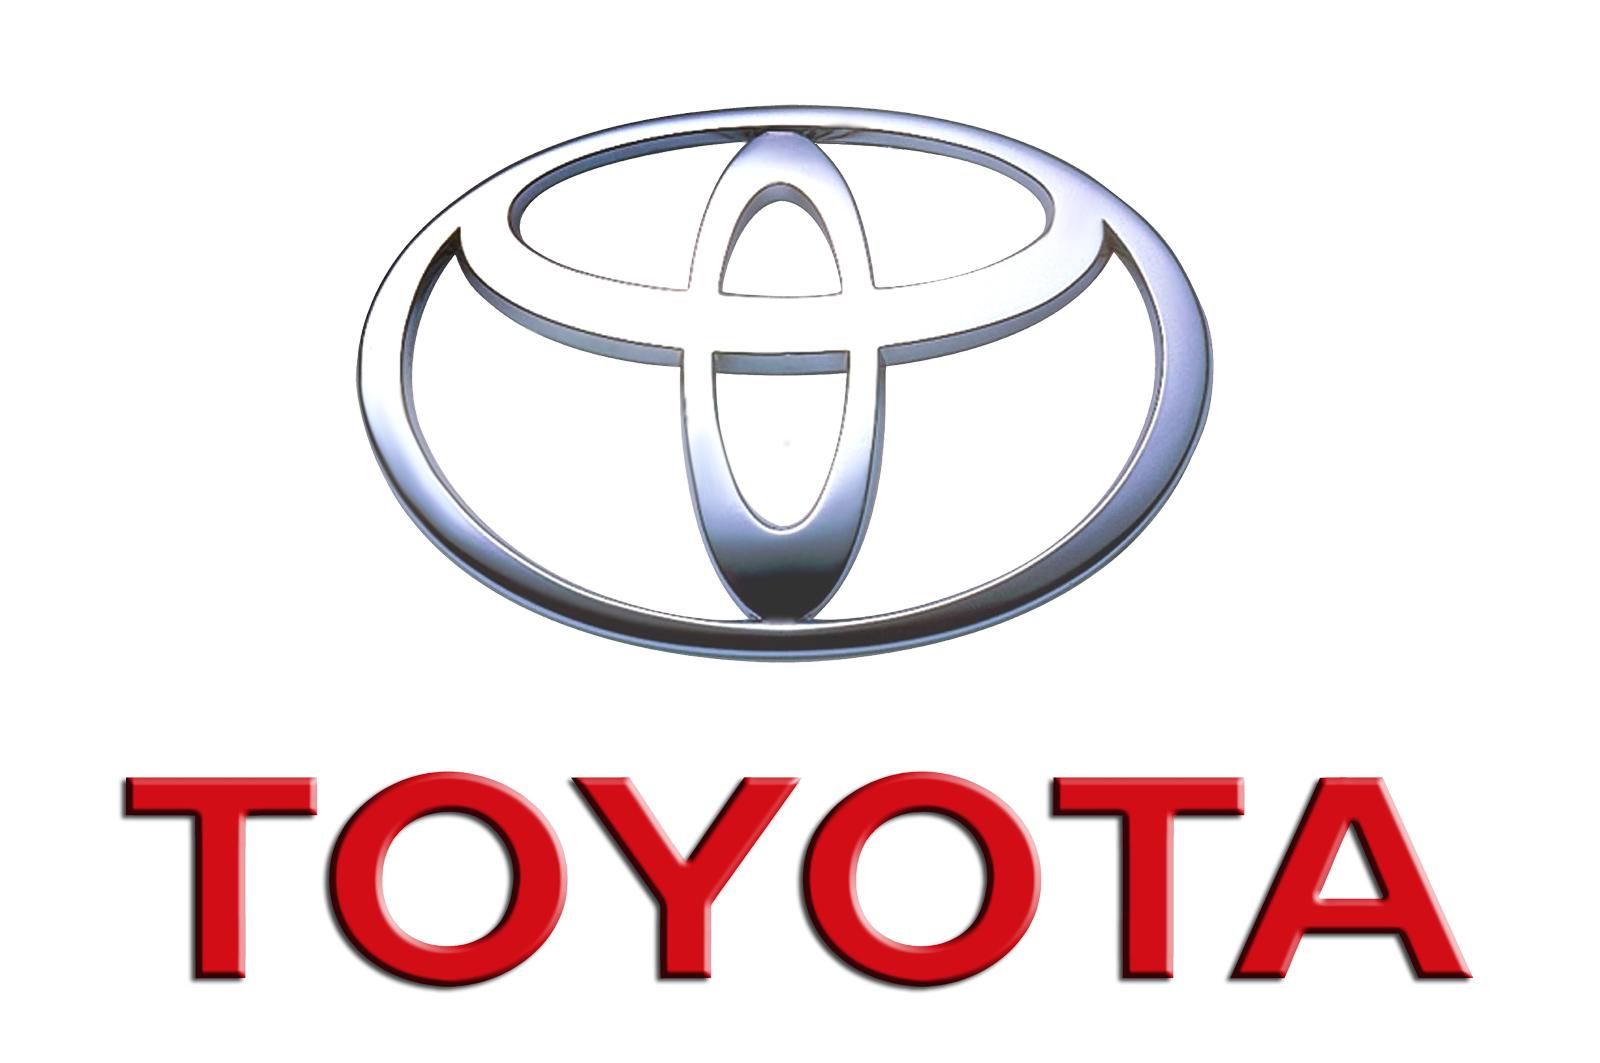 Toyota HVAC MEP mechanical engineering design b.jpg